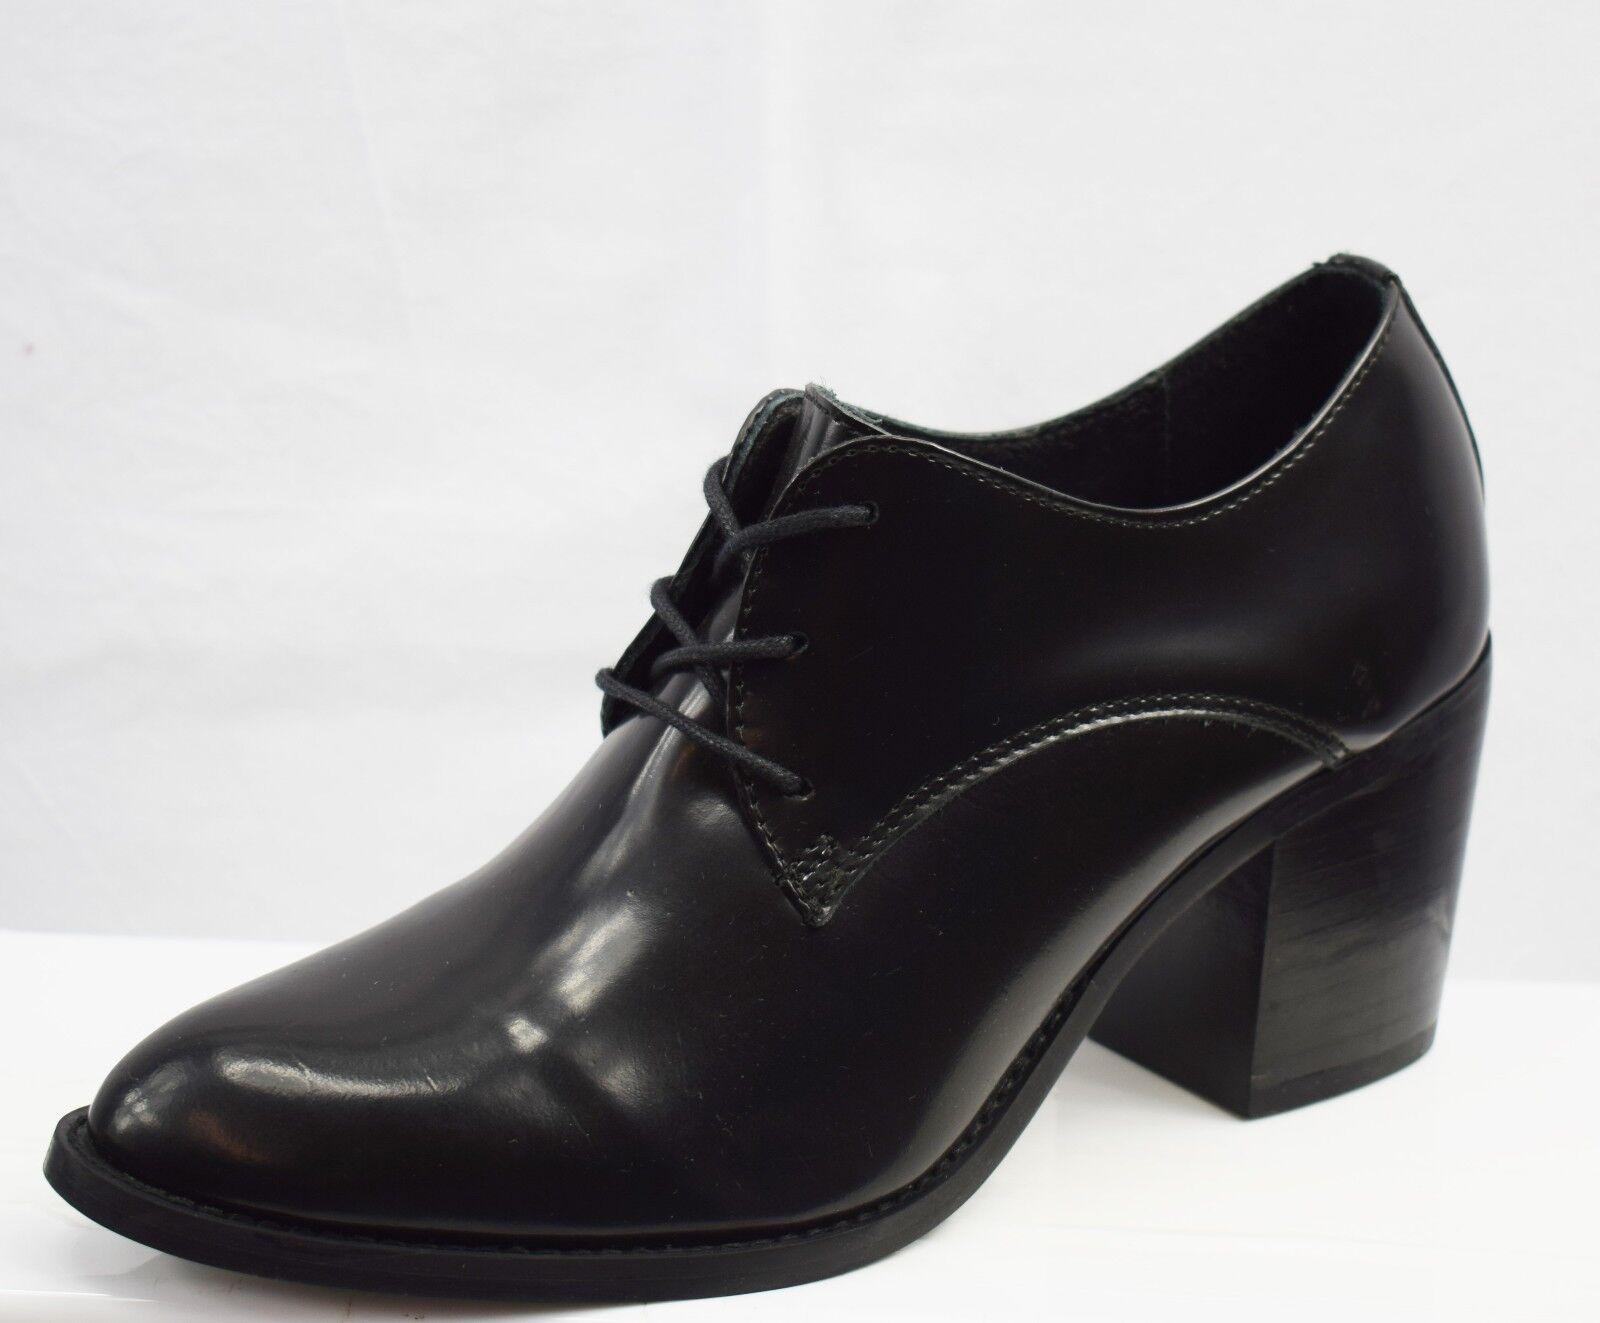 STEVE MADDEN  LADIES Schuhe BRAND NEW SIZE UK 3.5 (Fi7)